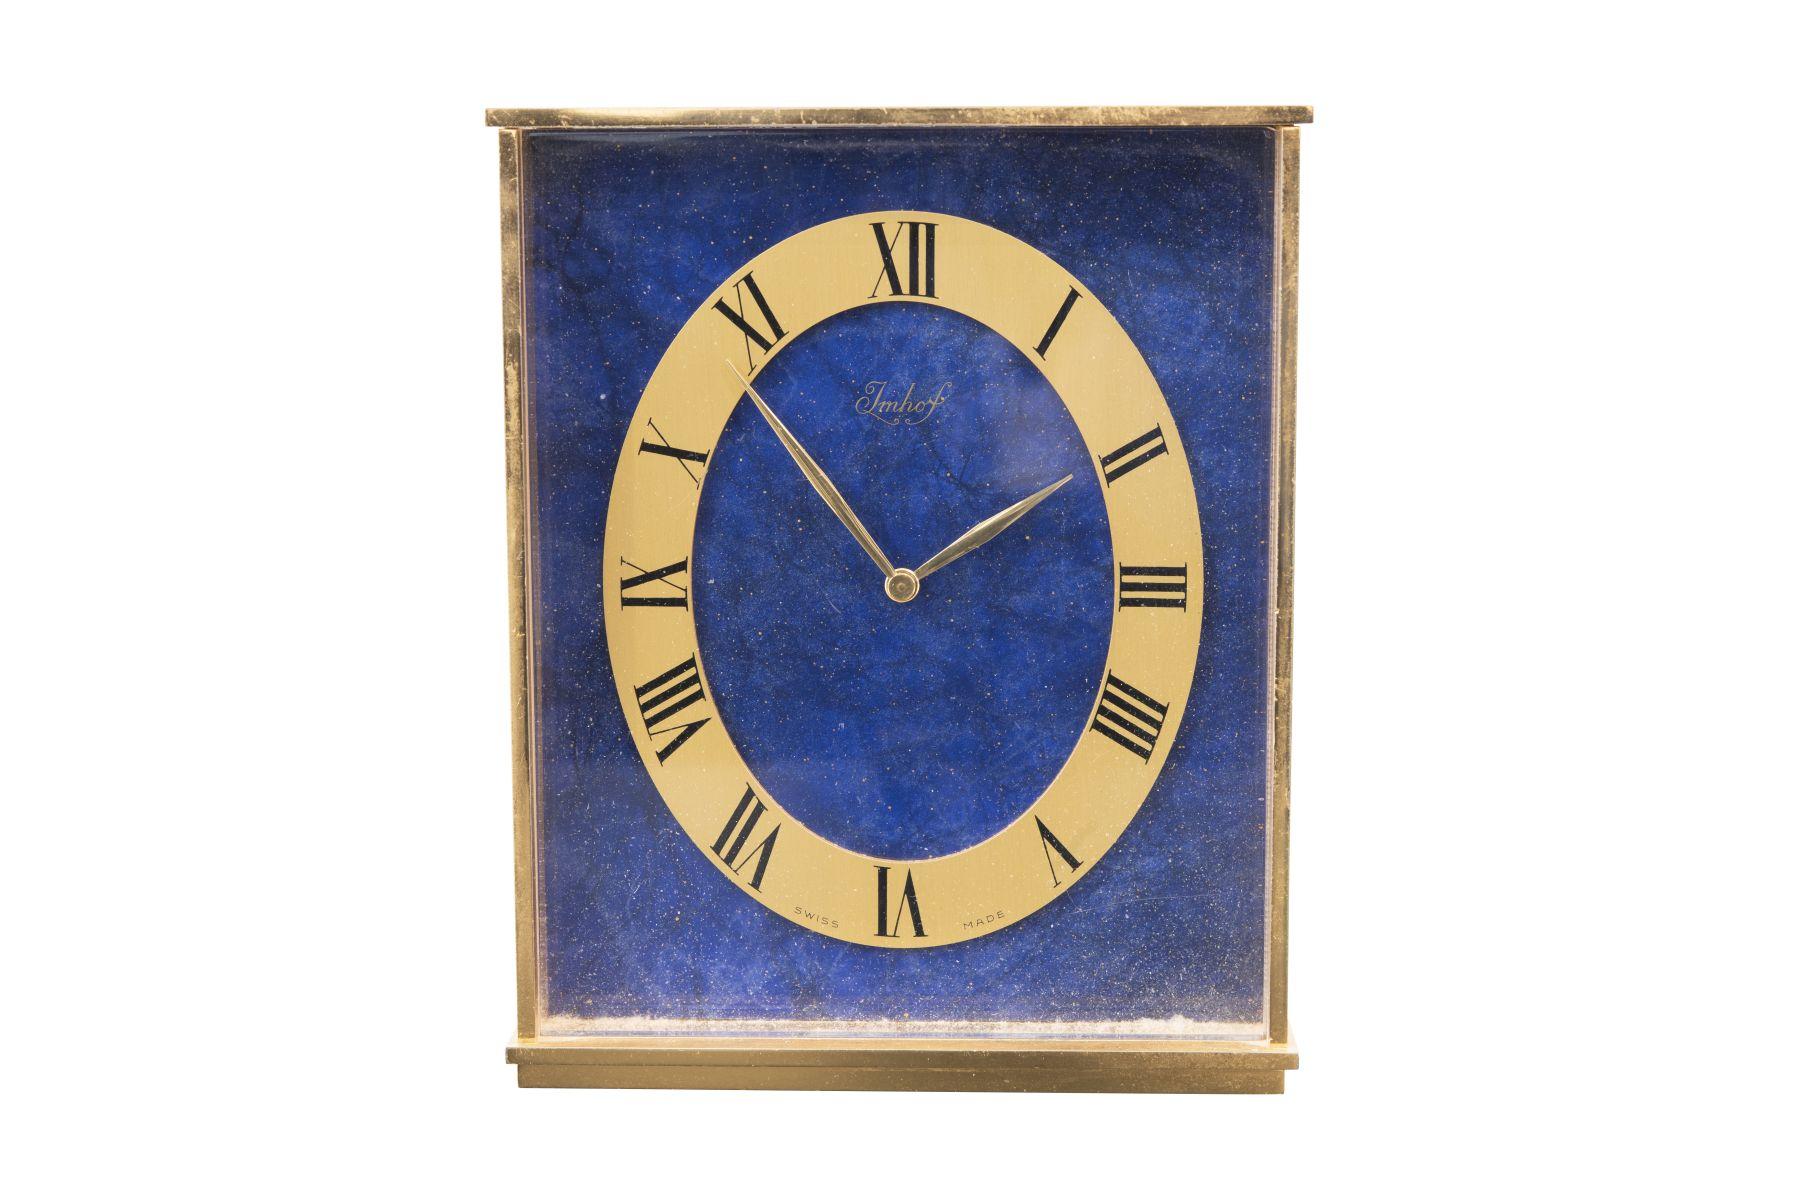 #44 IImhof Table clock 8 days | Imhof Tischuhr 8 Tage Image